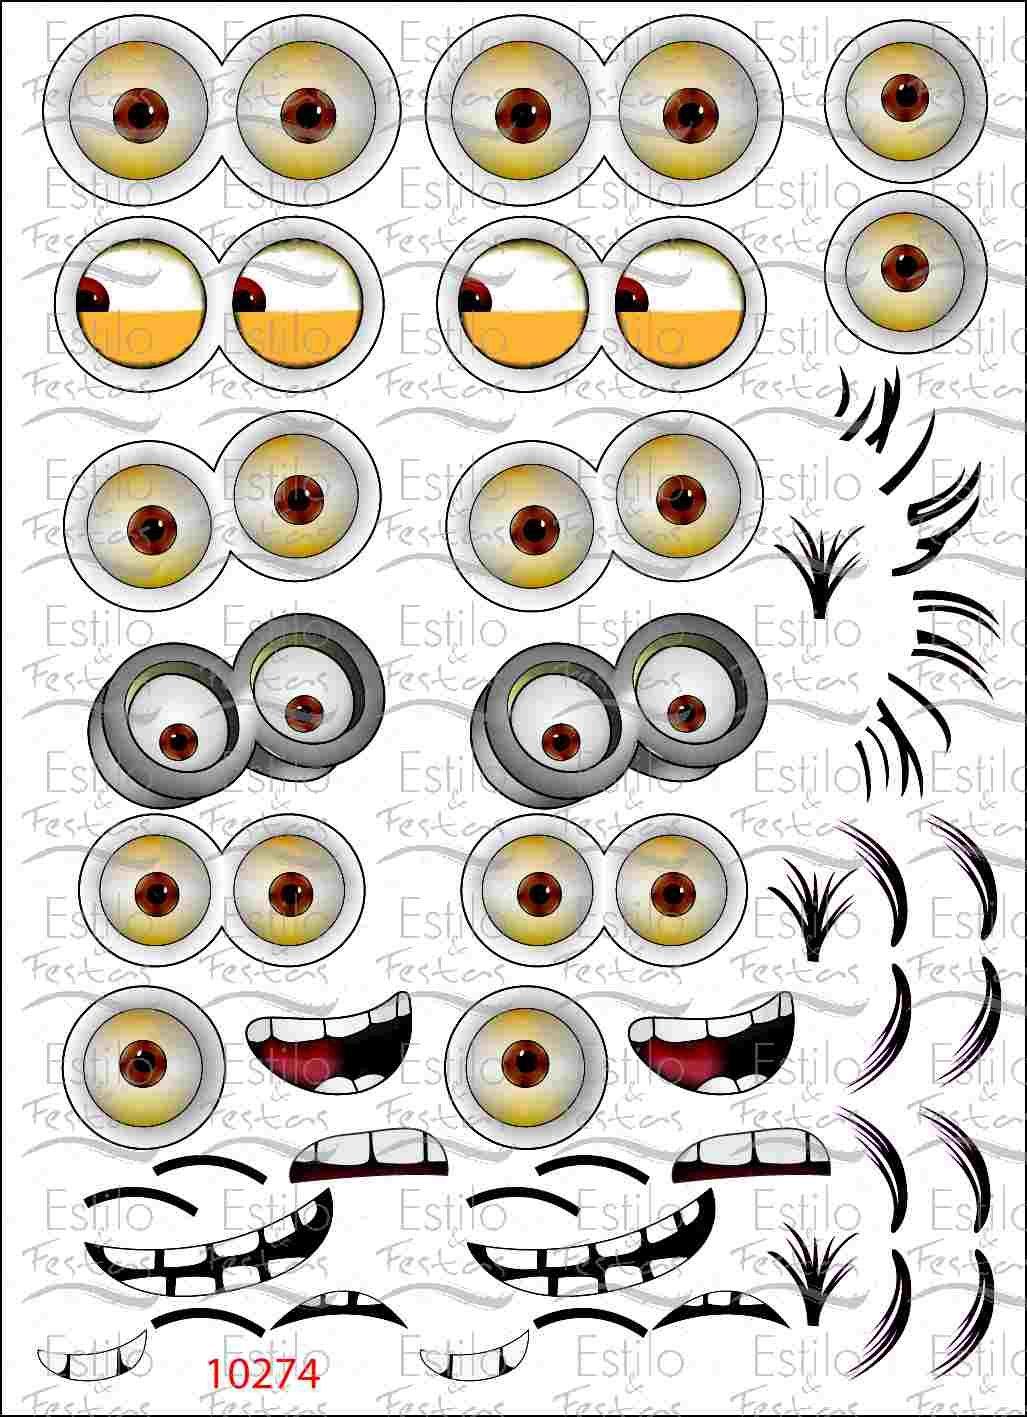 Adesivo Olhos Dos Minions Adesivo Para Balao Turma Dos Miniosns